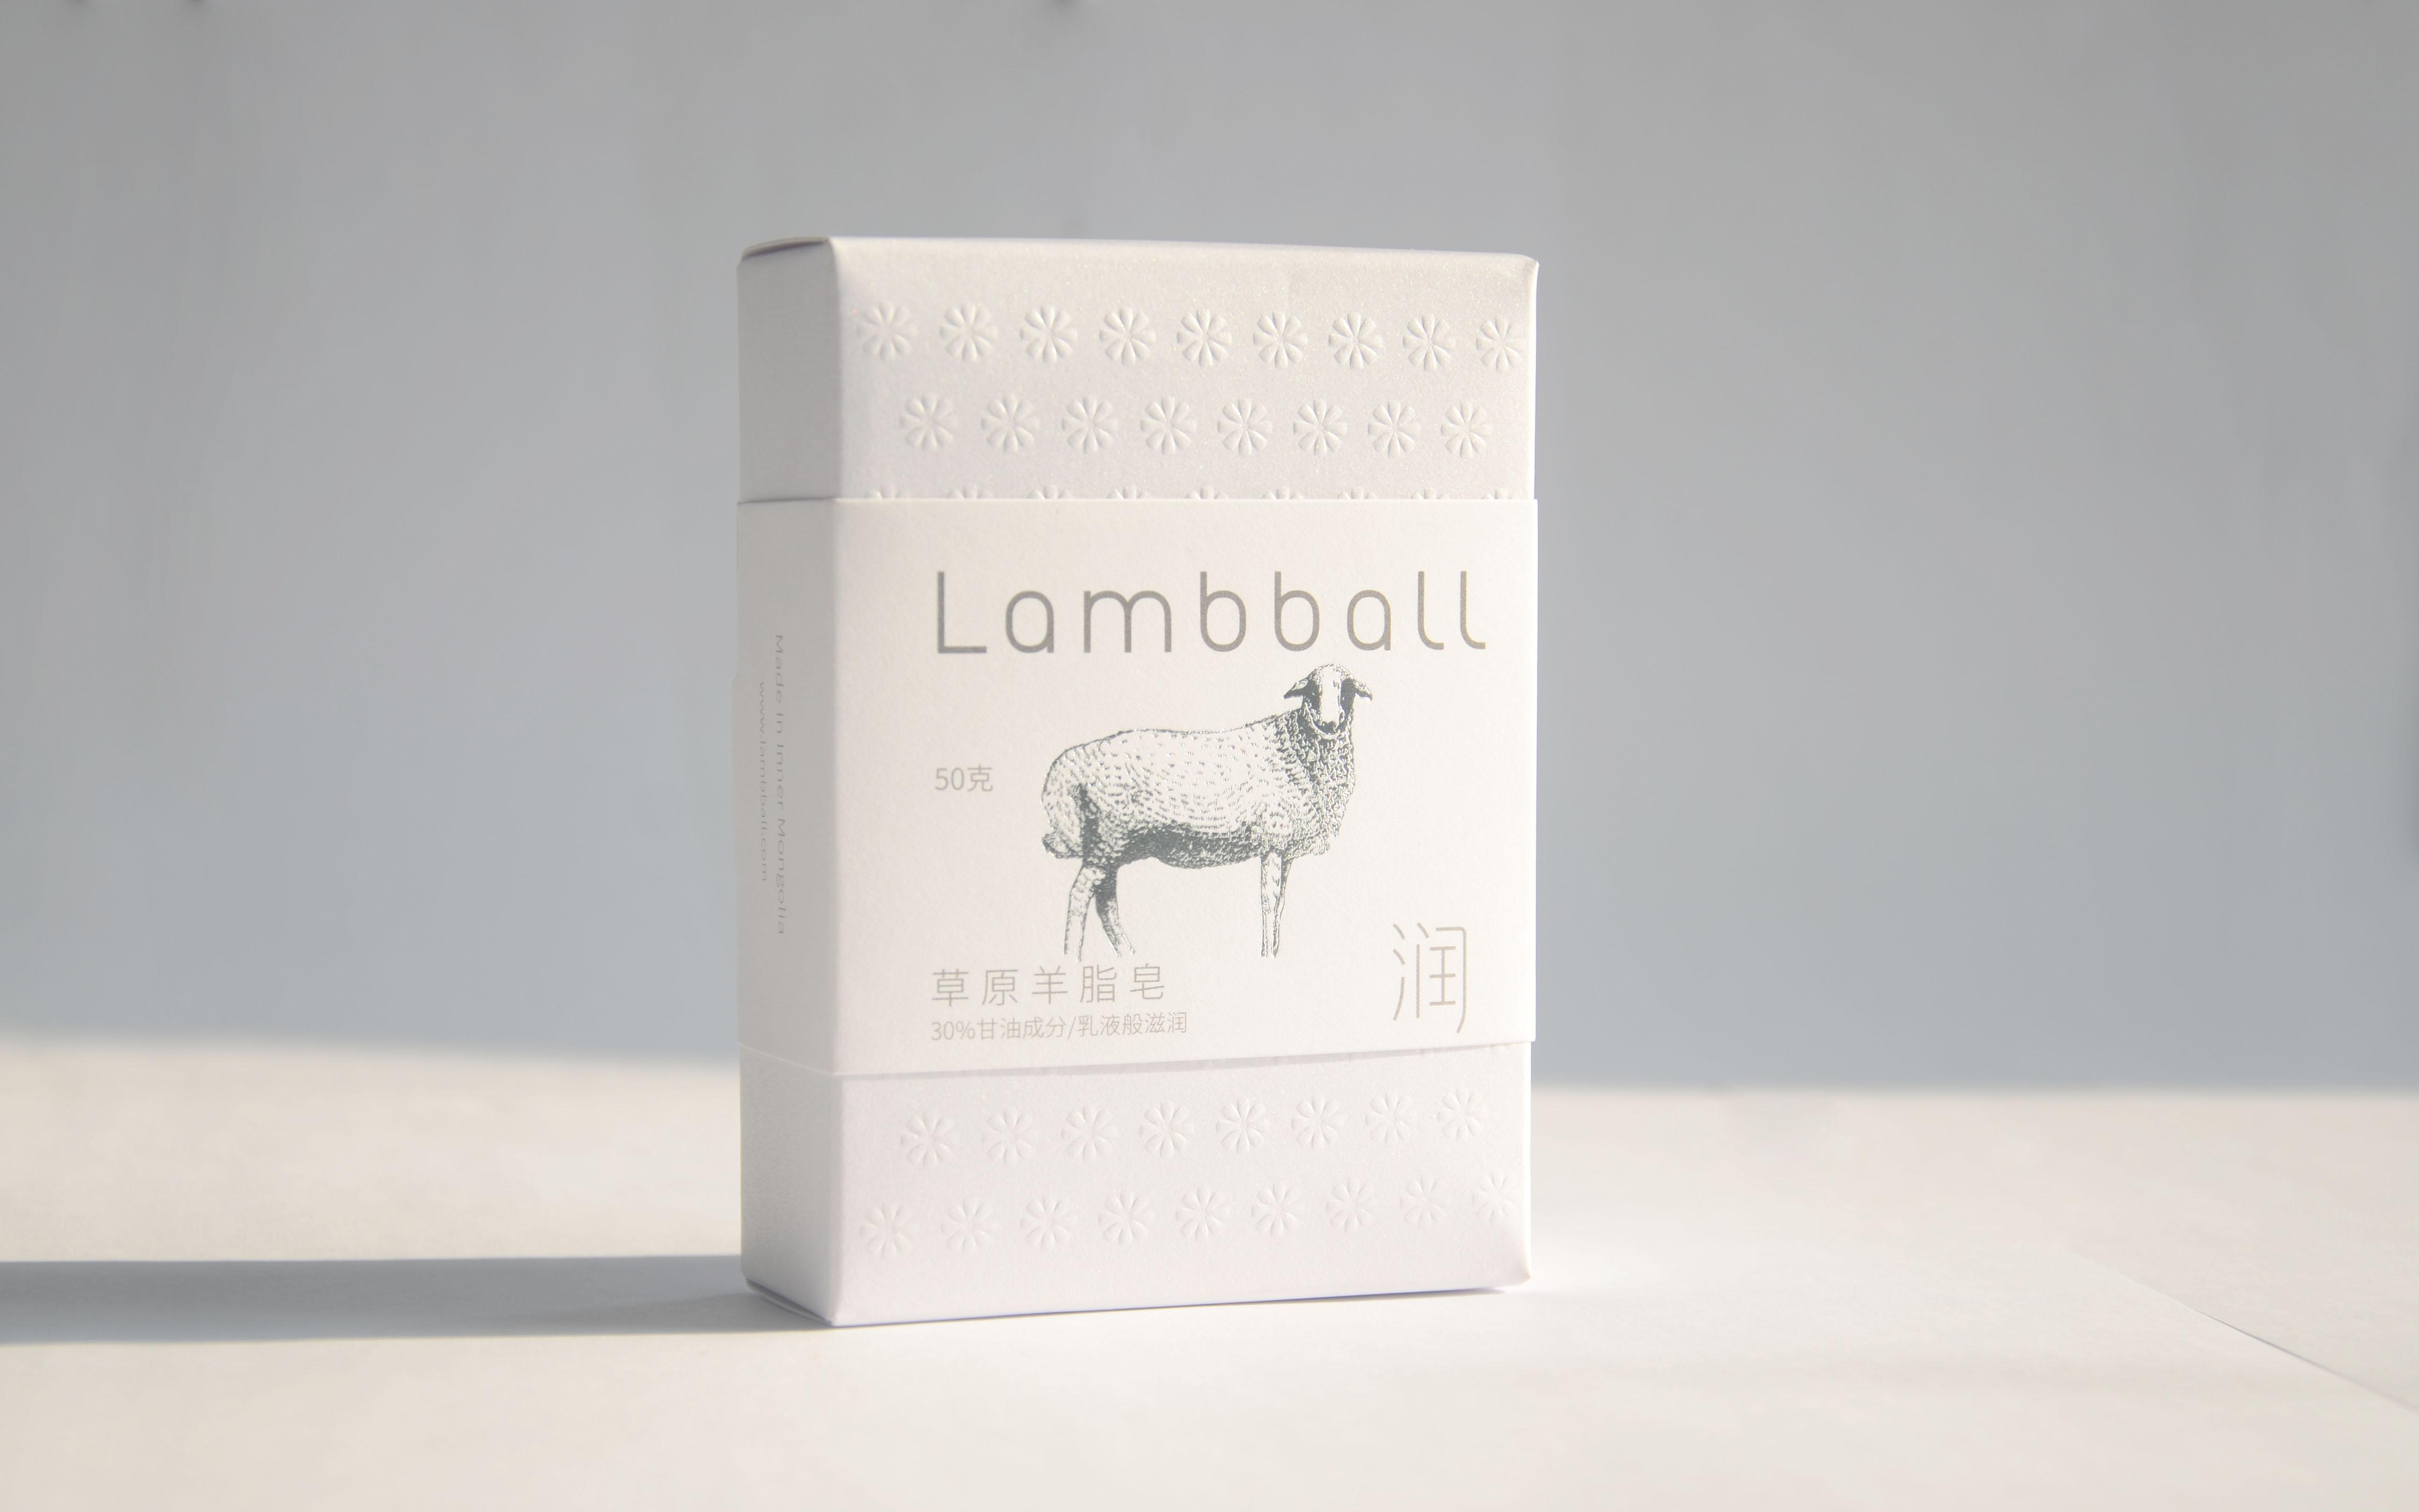 lambball羊脂皂包装设计 第4张 lambball羊脂皂包装设计 蒙古设计